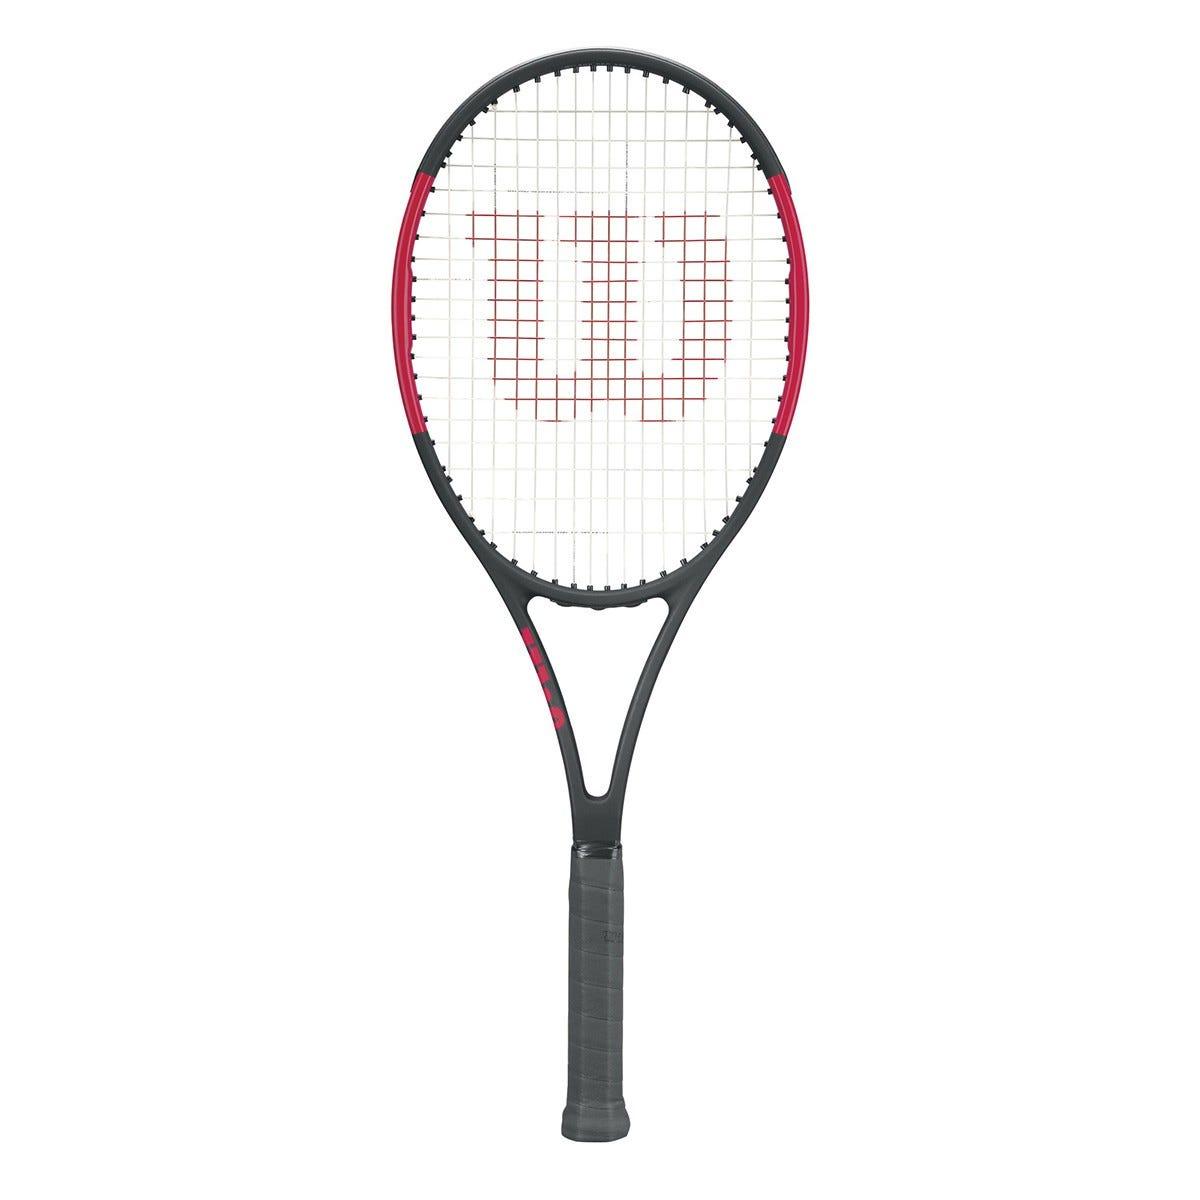 Terrific Tennis Racket Diagram Racquet Diagram From Reverse Electrical Wiring Database Cominyuccorg